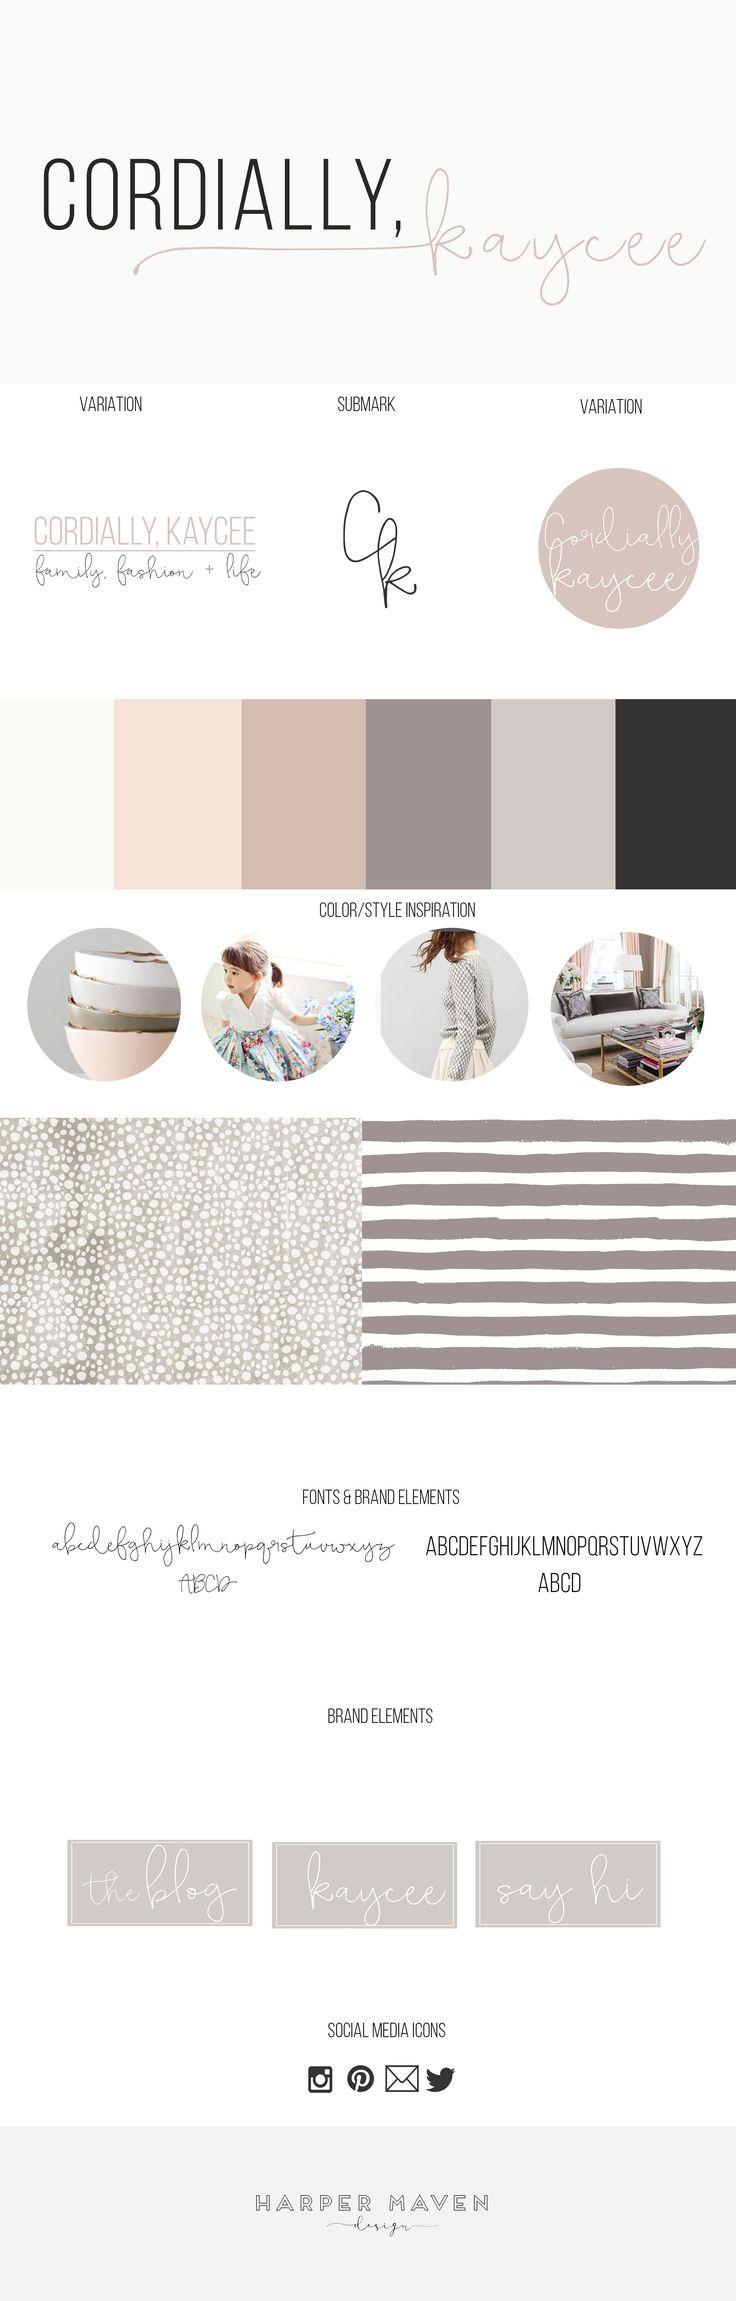 Cordially, Kaycee Brand Design by Harper Maven Design | www.harpermavendesign.com